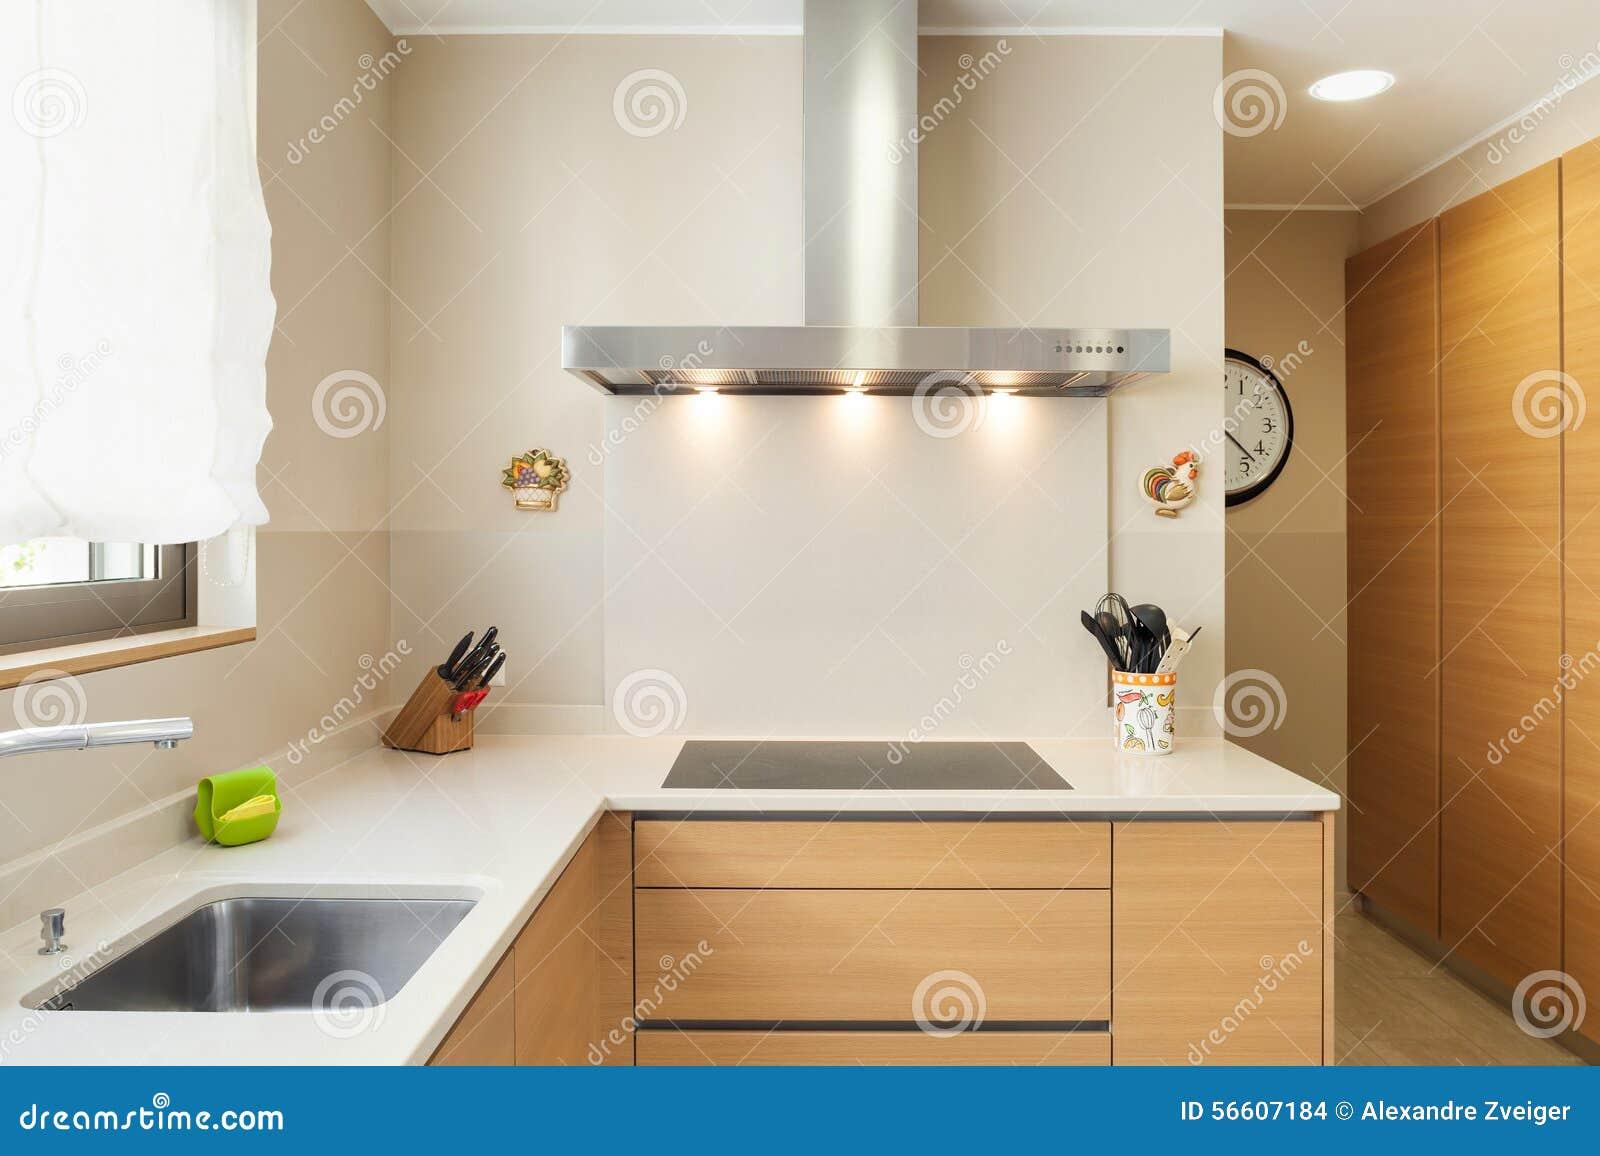 Appartement meublé, cuisine moderne photo stock   image: 56607184